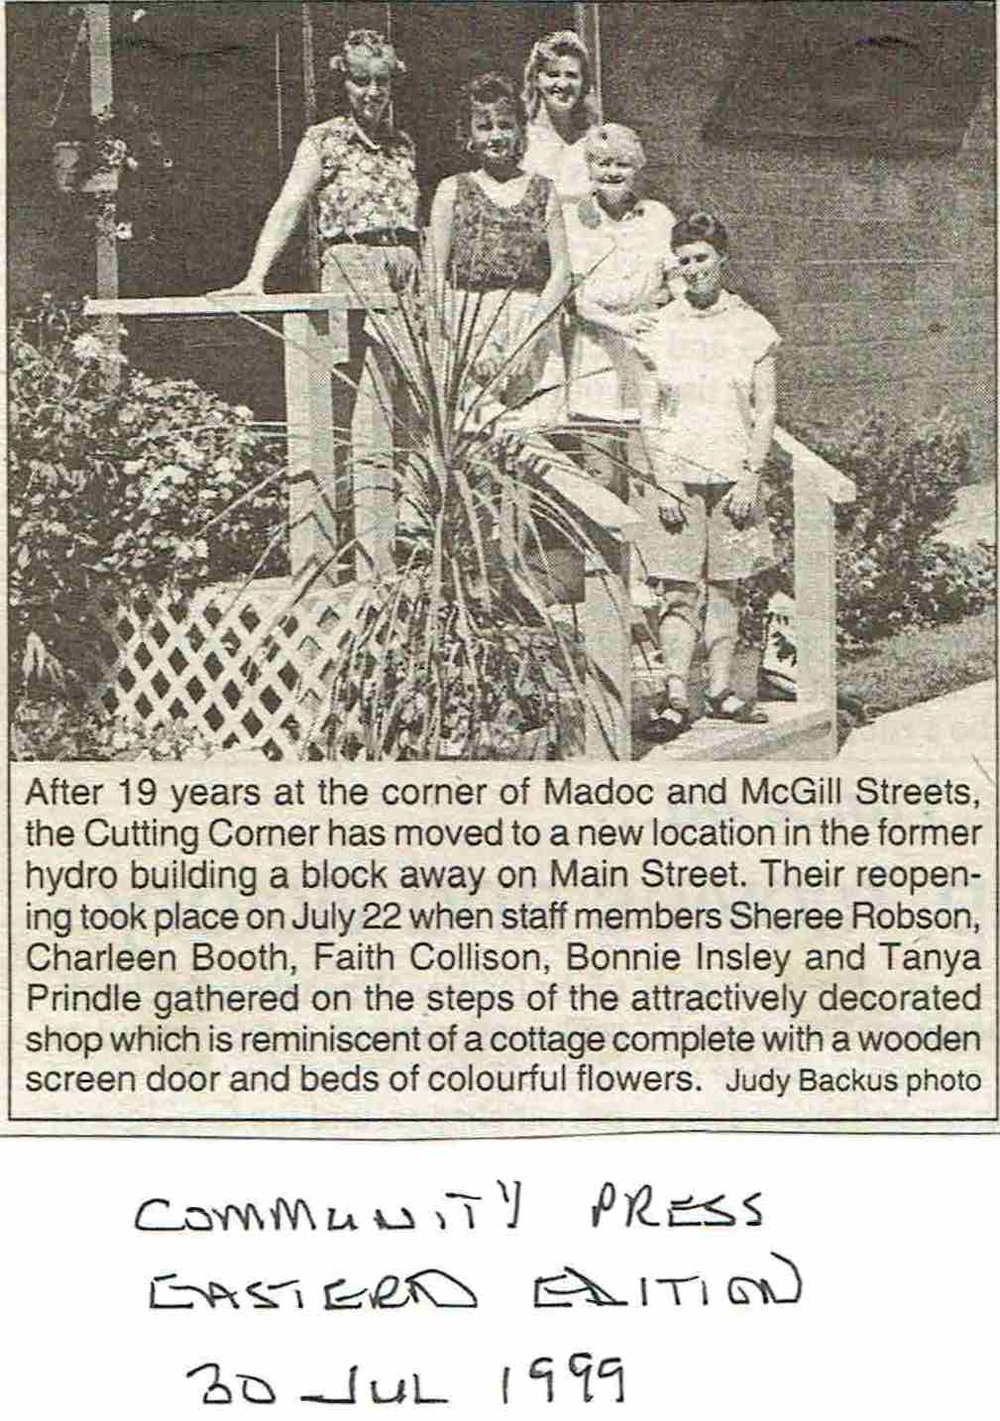 Cutting Corner 1999.JPG